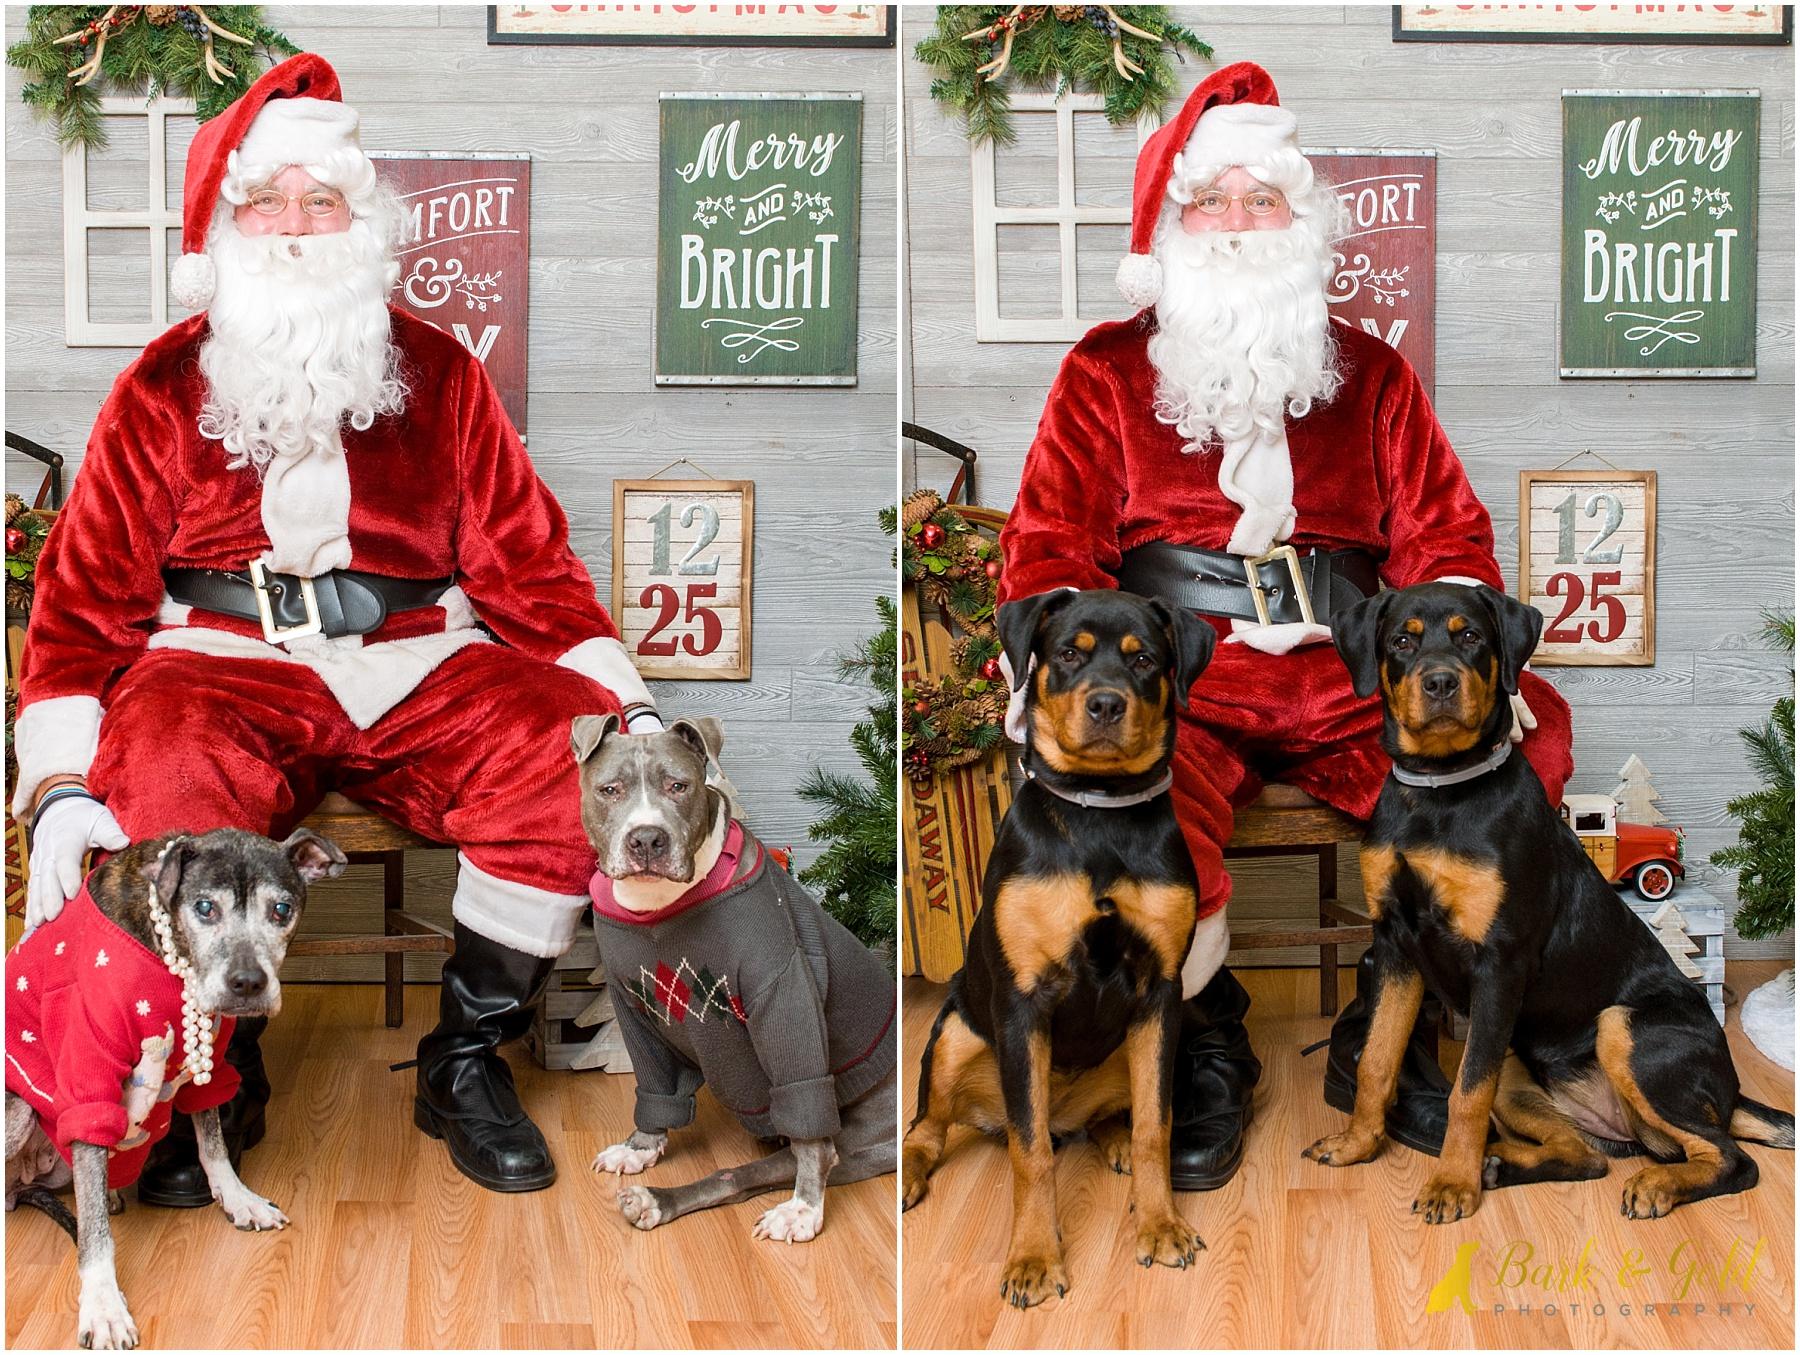 pit bulls and rottweilers meeting Santa during 2017 pet photos with Santa at Petagogy